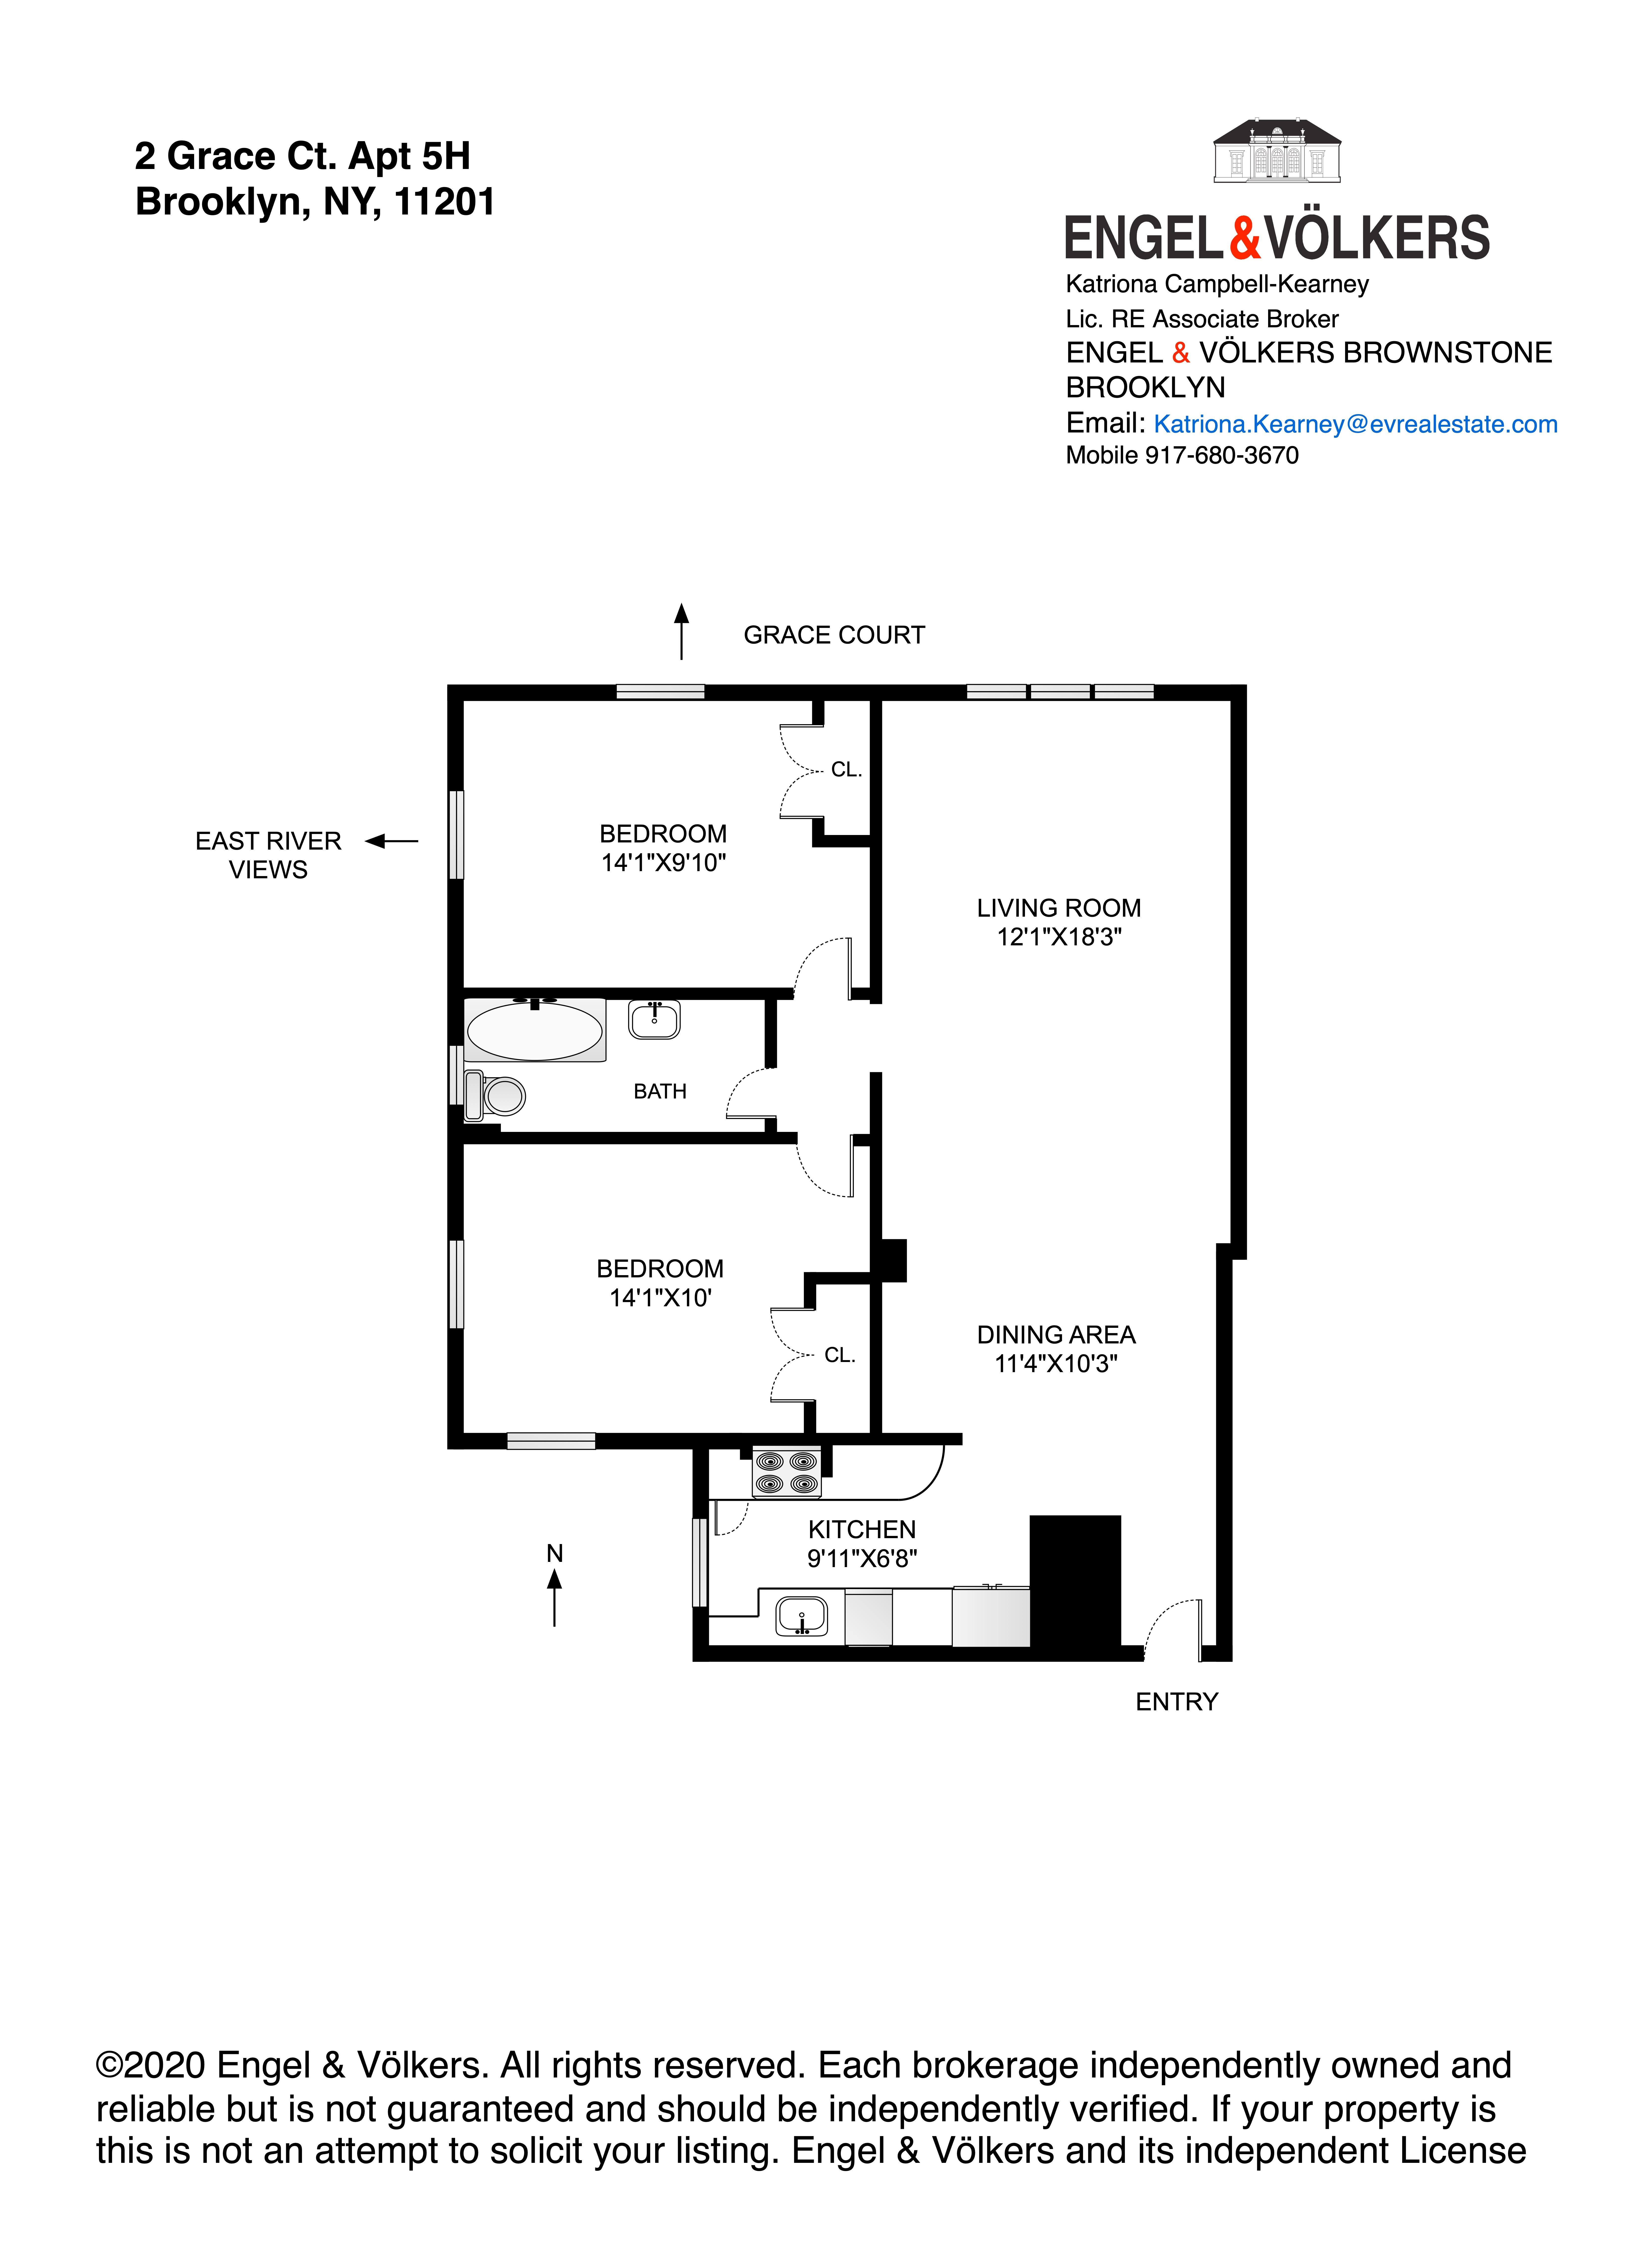 Apartment for sale at 2 Grace Court, Apt 5H